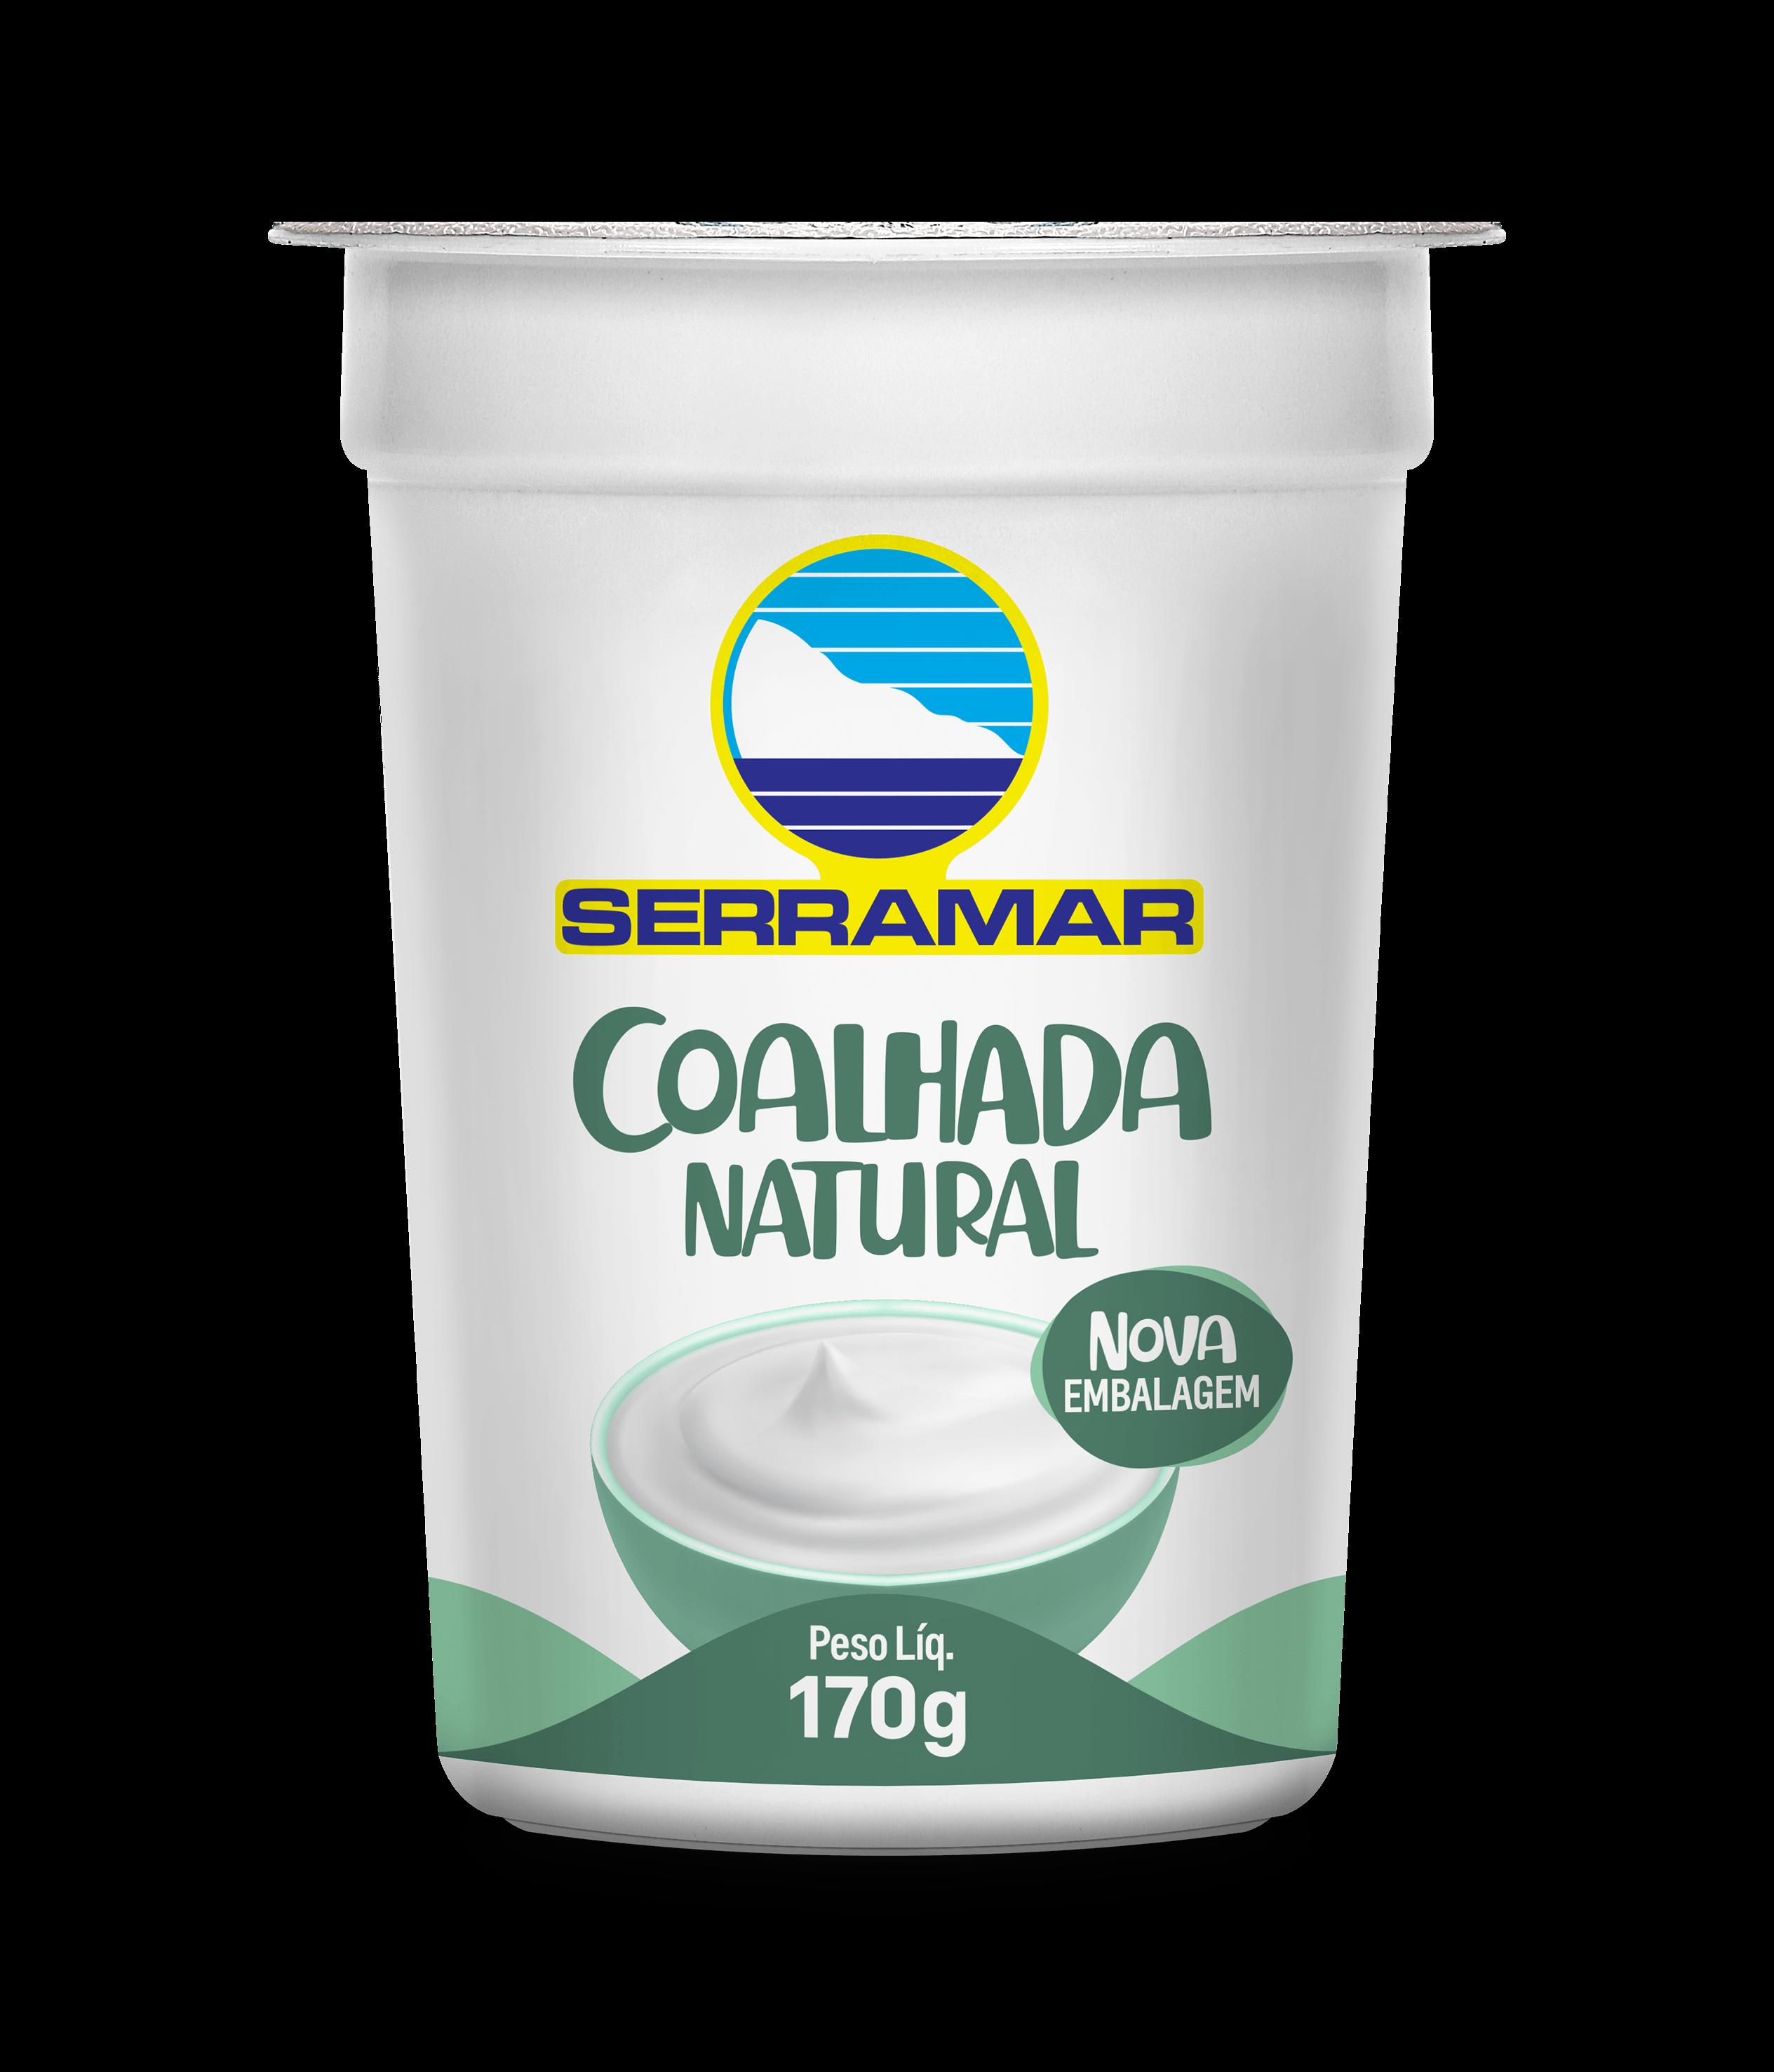 Coalhada Natural